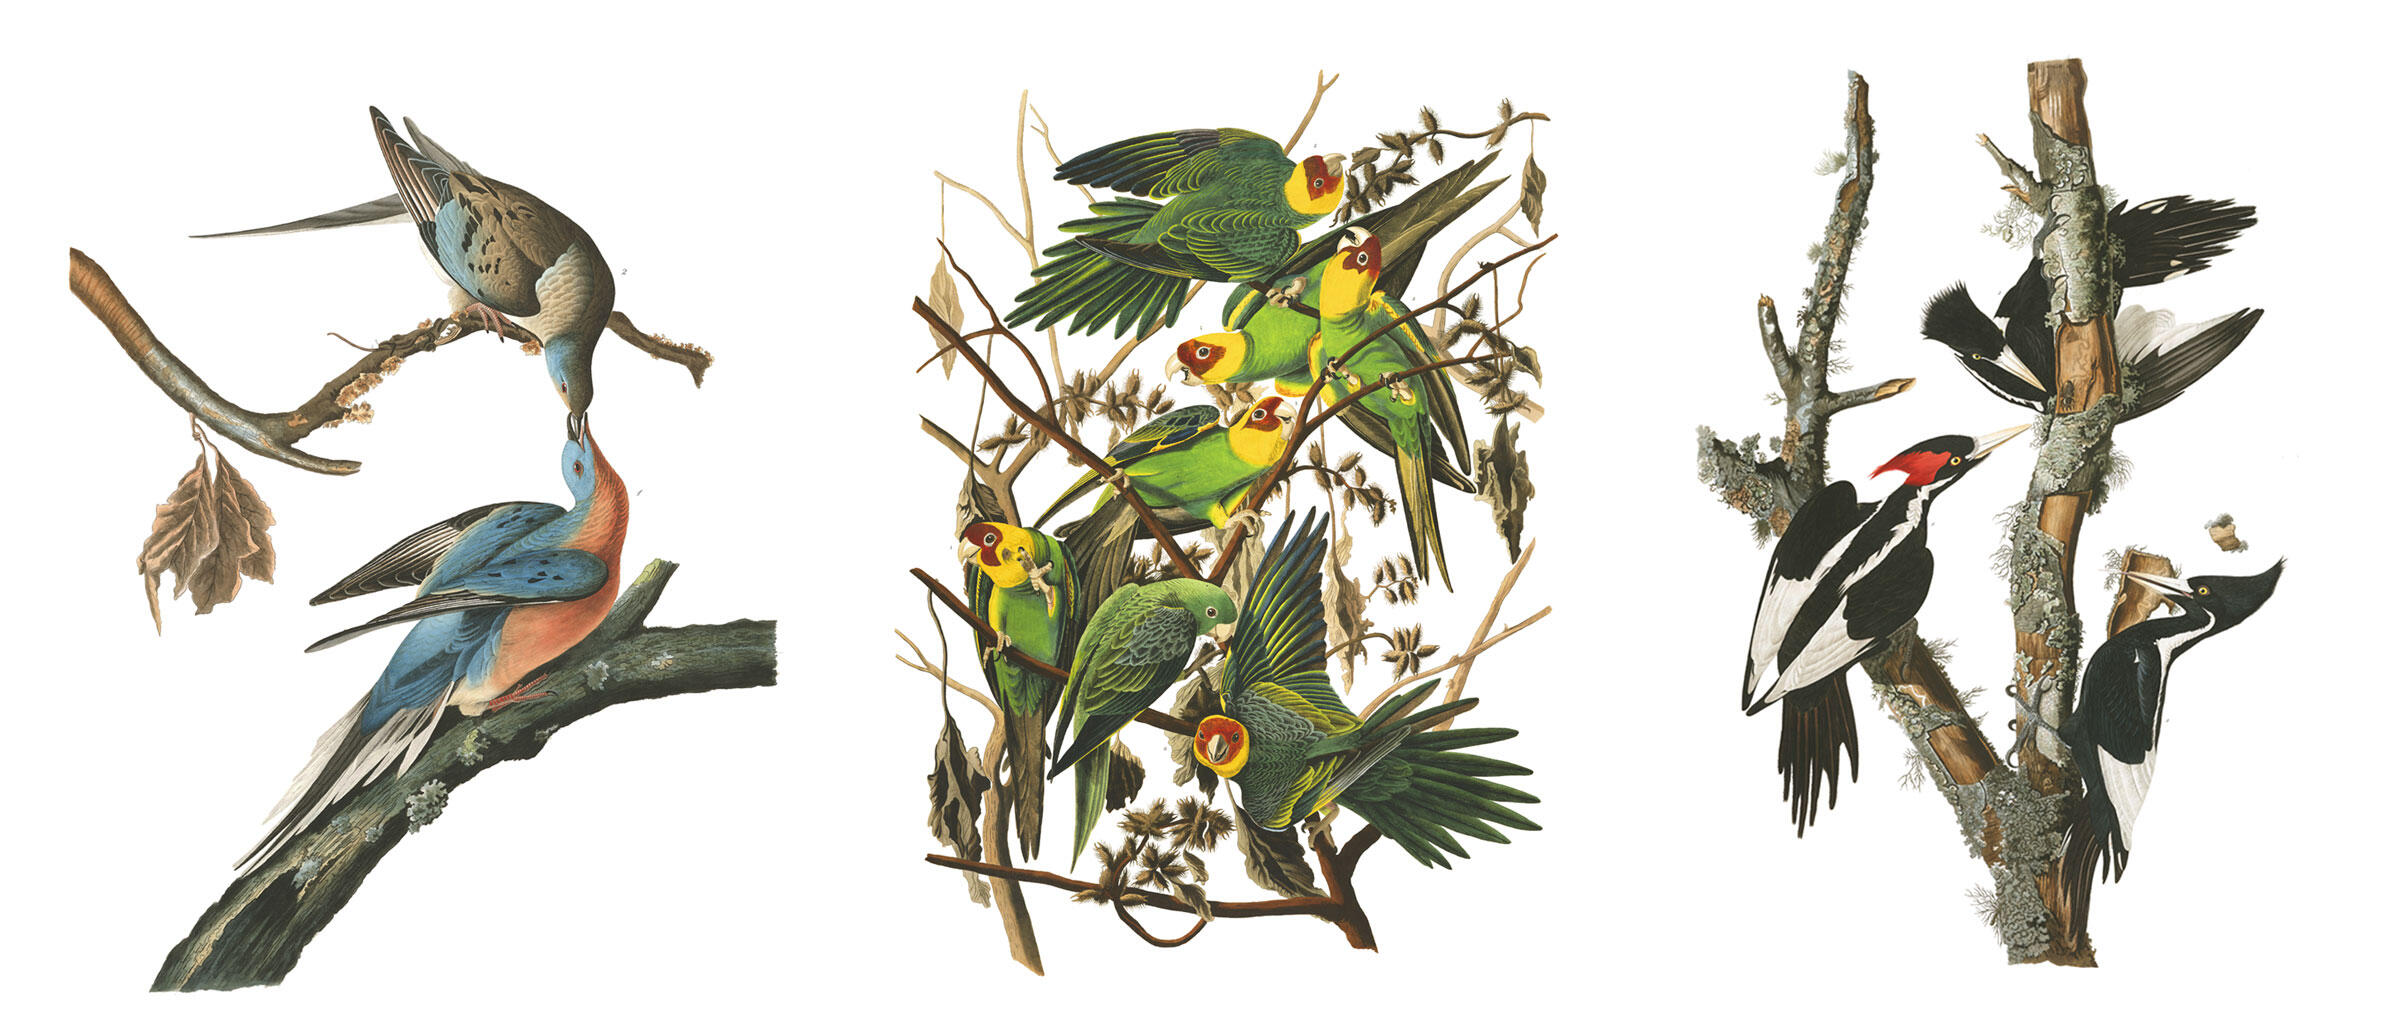 Passenger Pigeons, Carolina Parakeets, and Ivory-billed Woodpeckers—all birds now considered extinct. Illustrations: John James Audubon